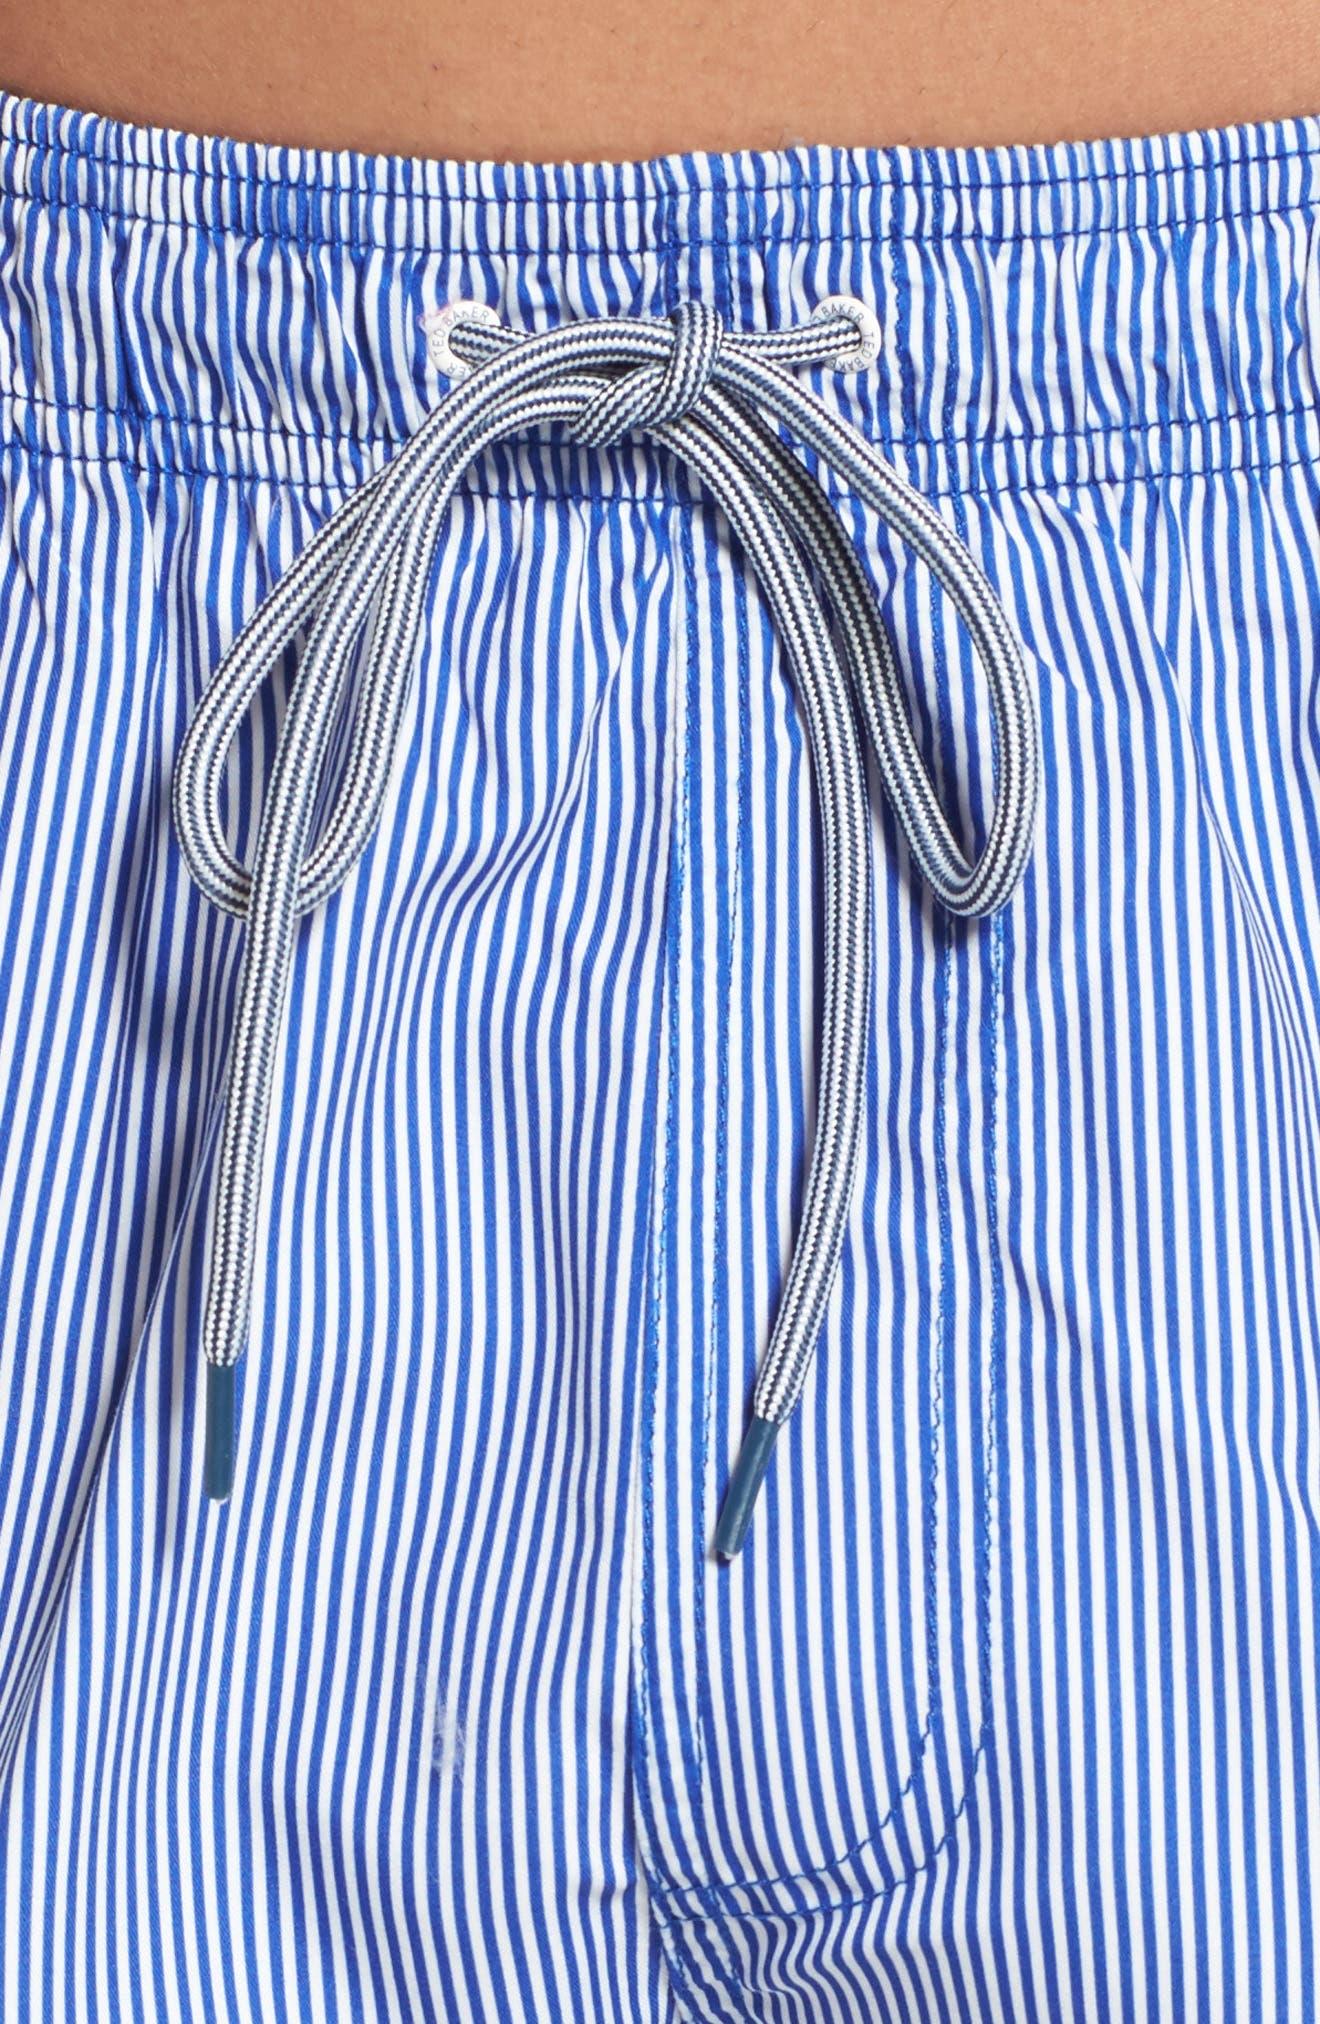 Alternate Image 4  - Ted Baker London One-Way Stripe Swim Trunks